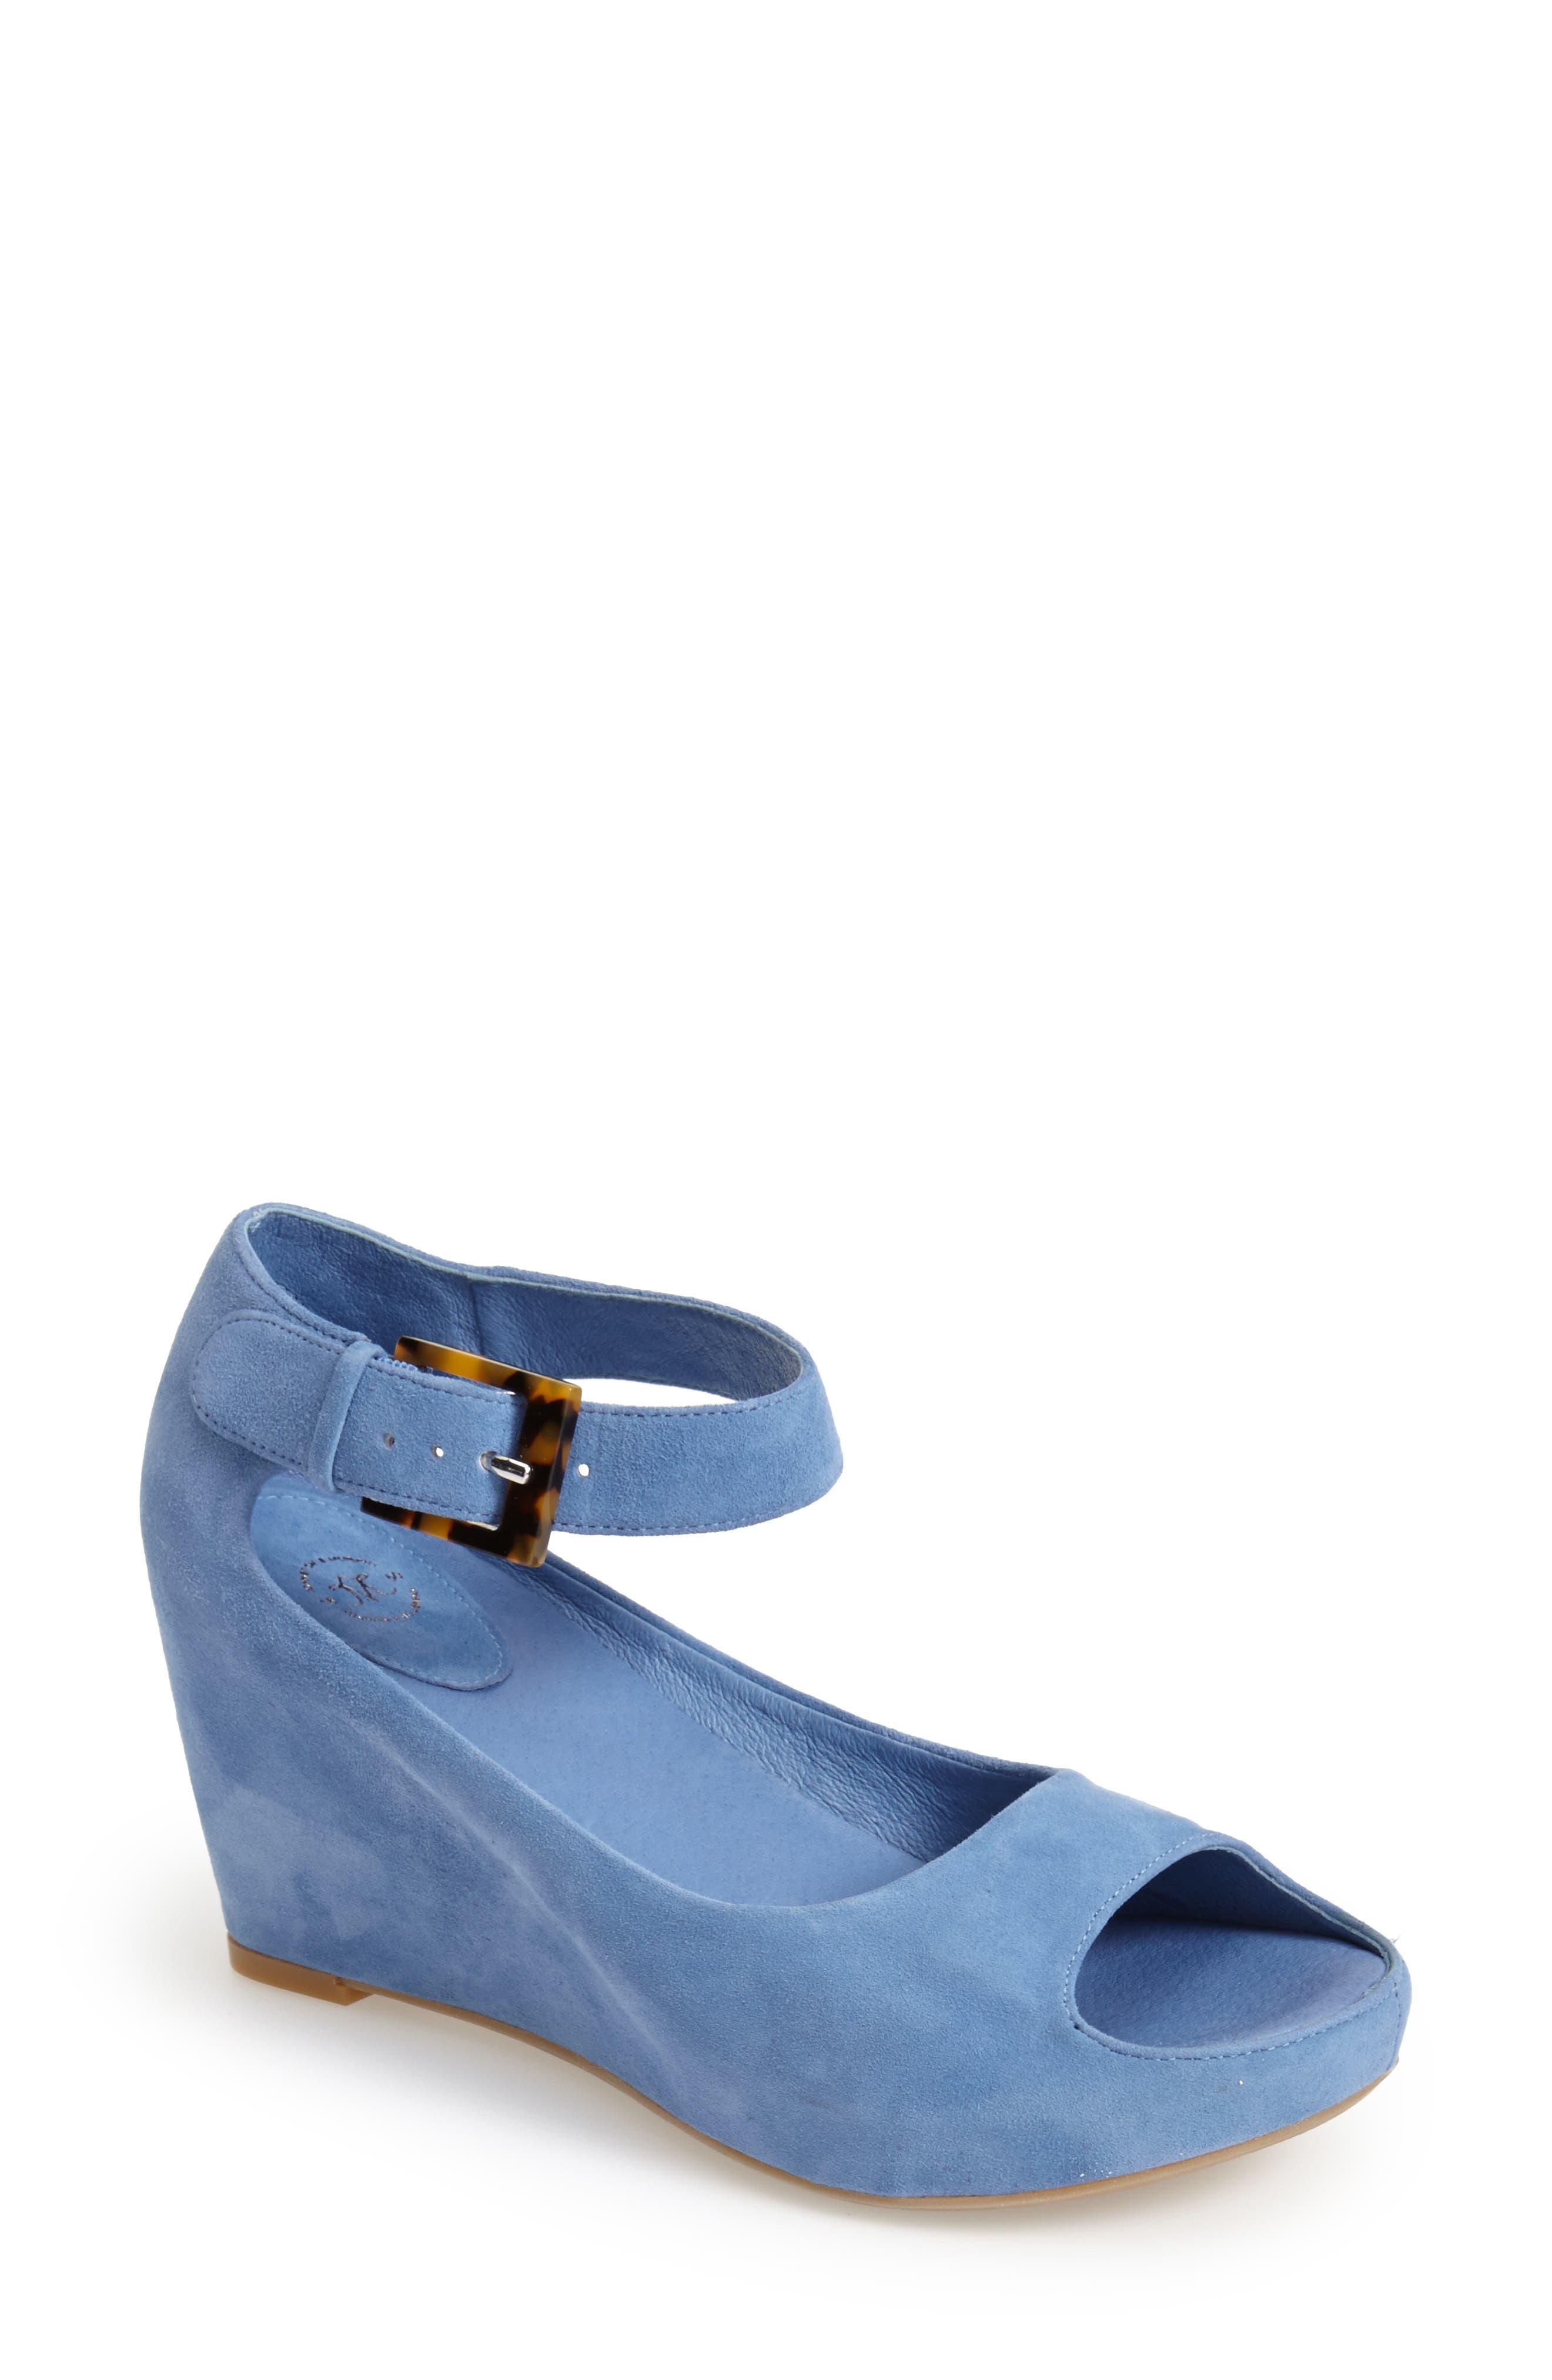 'Tricia' Ankle Strap Sandal,                             Alternate thumbnail 39, color,